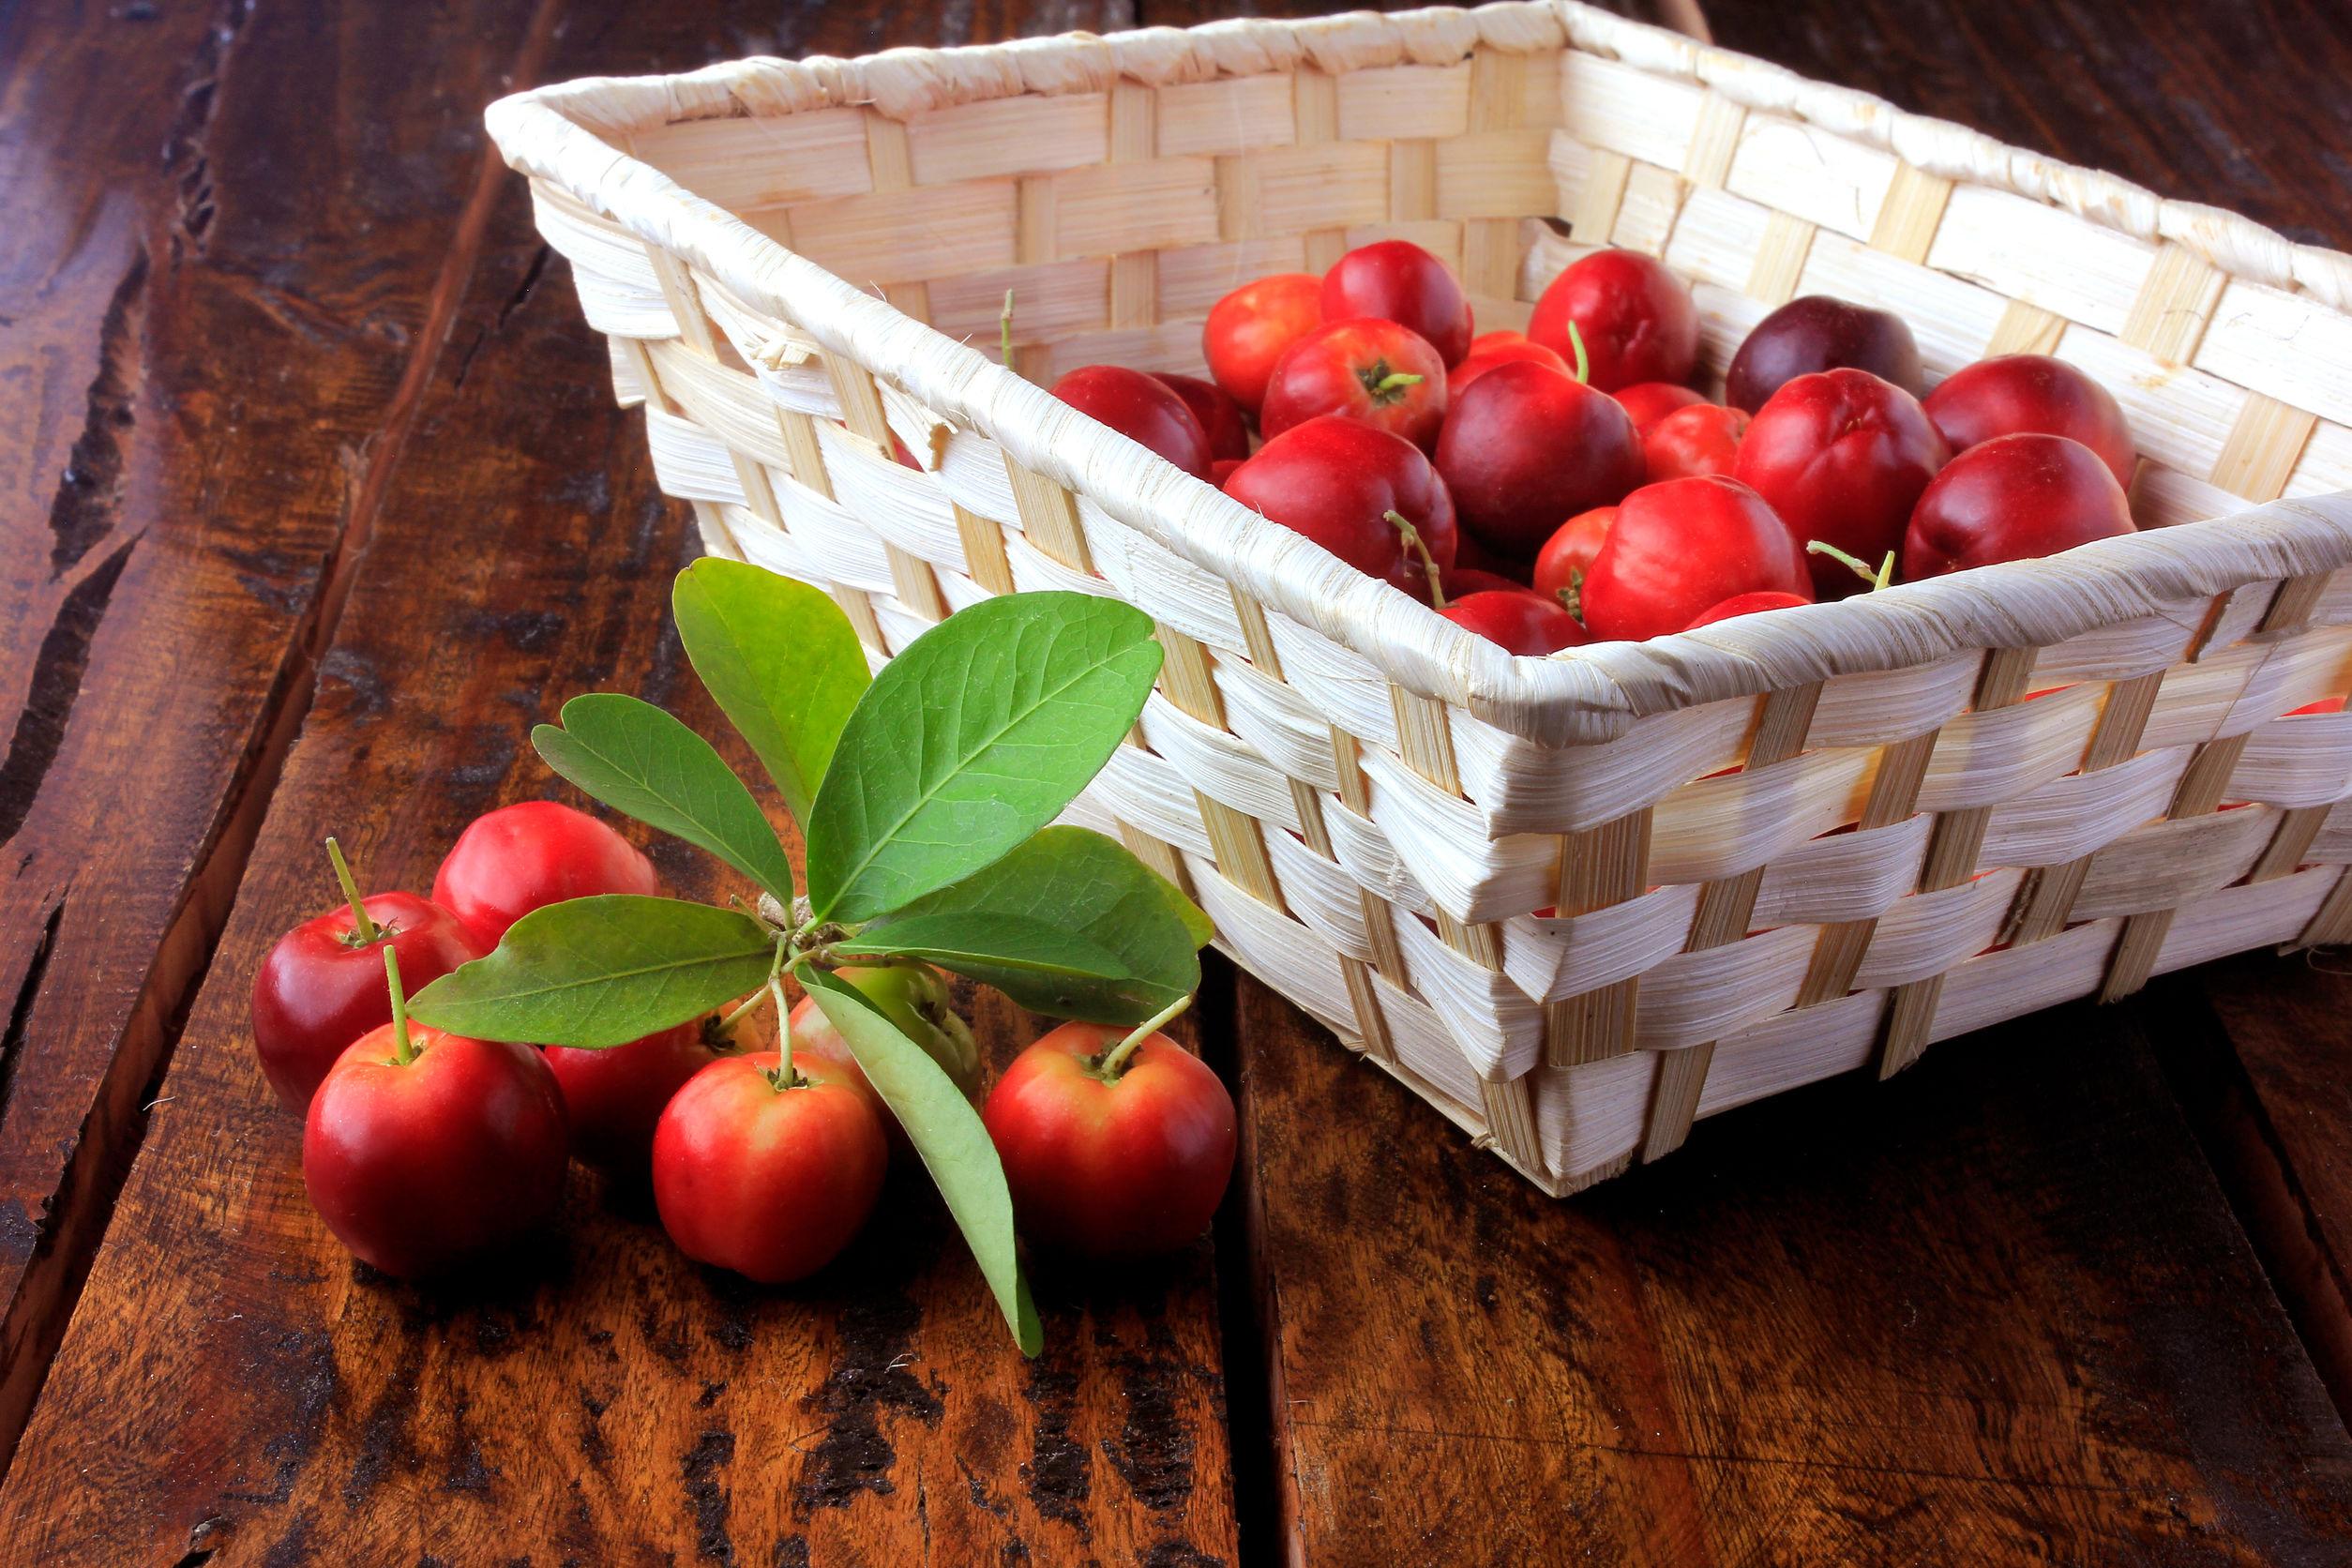 Acerola Cereza cruda, fresca, caja sobre mesa de madera rústica, frutas antioxidantes. Vitamina C alta